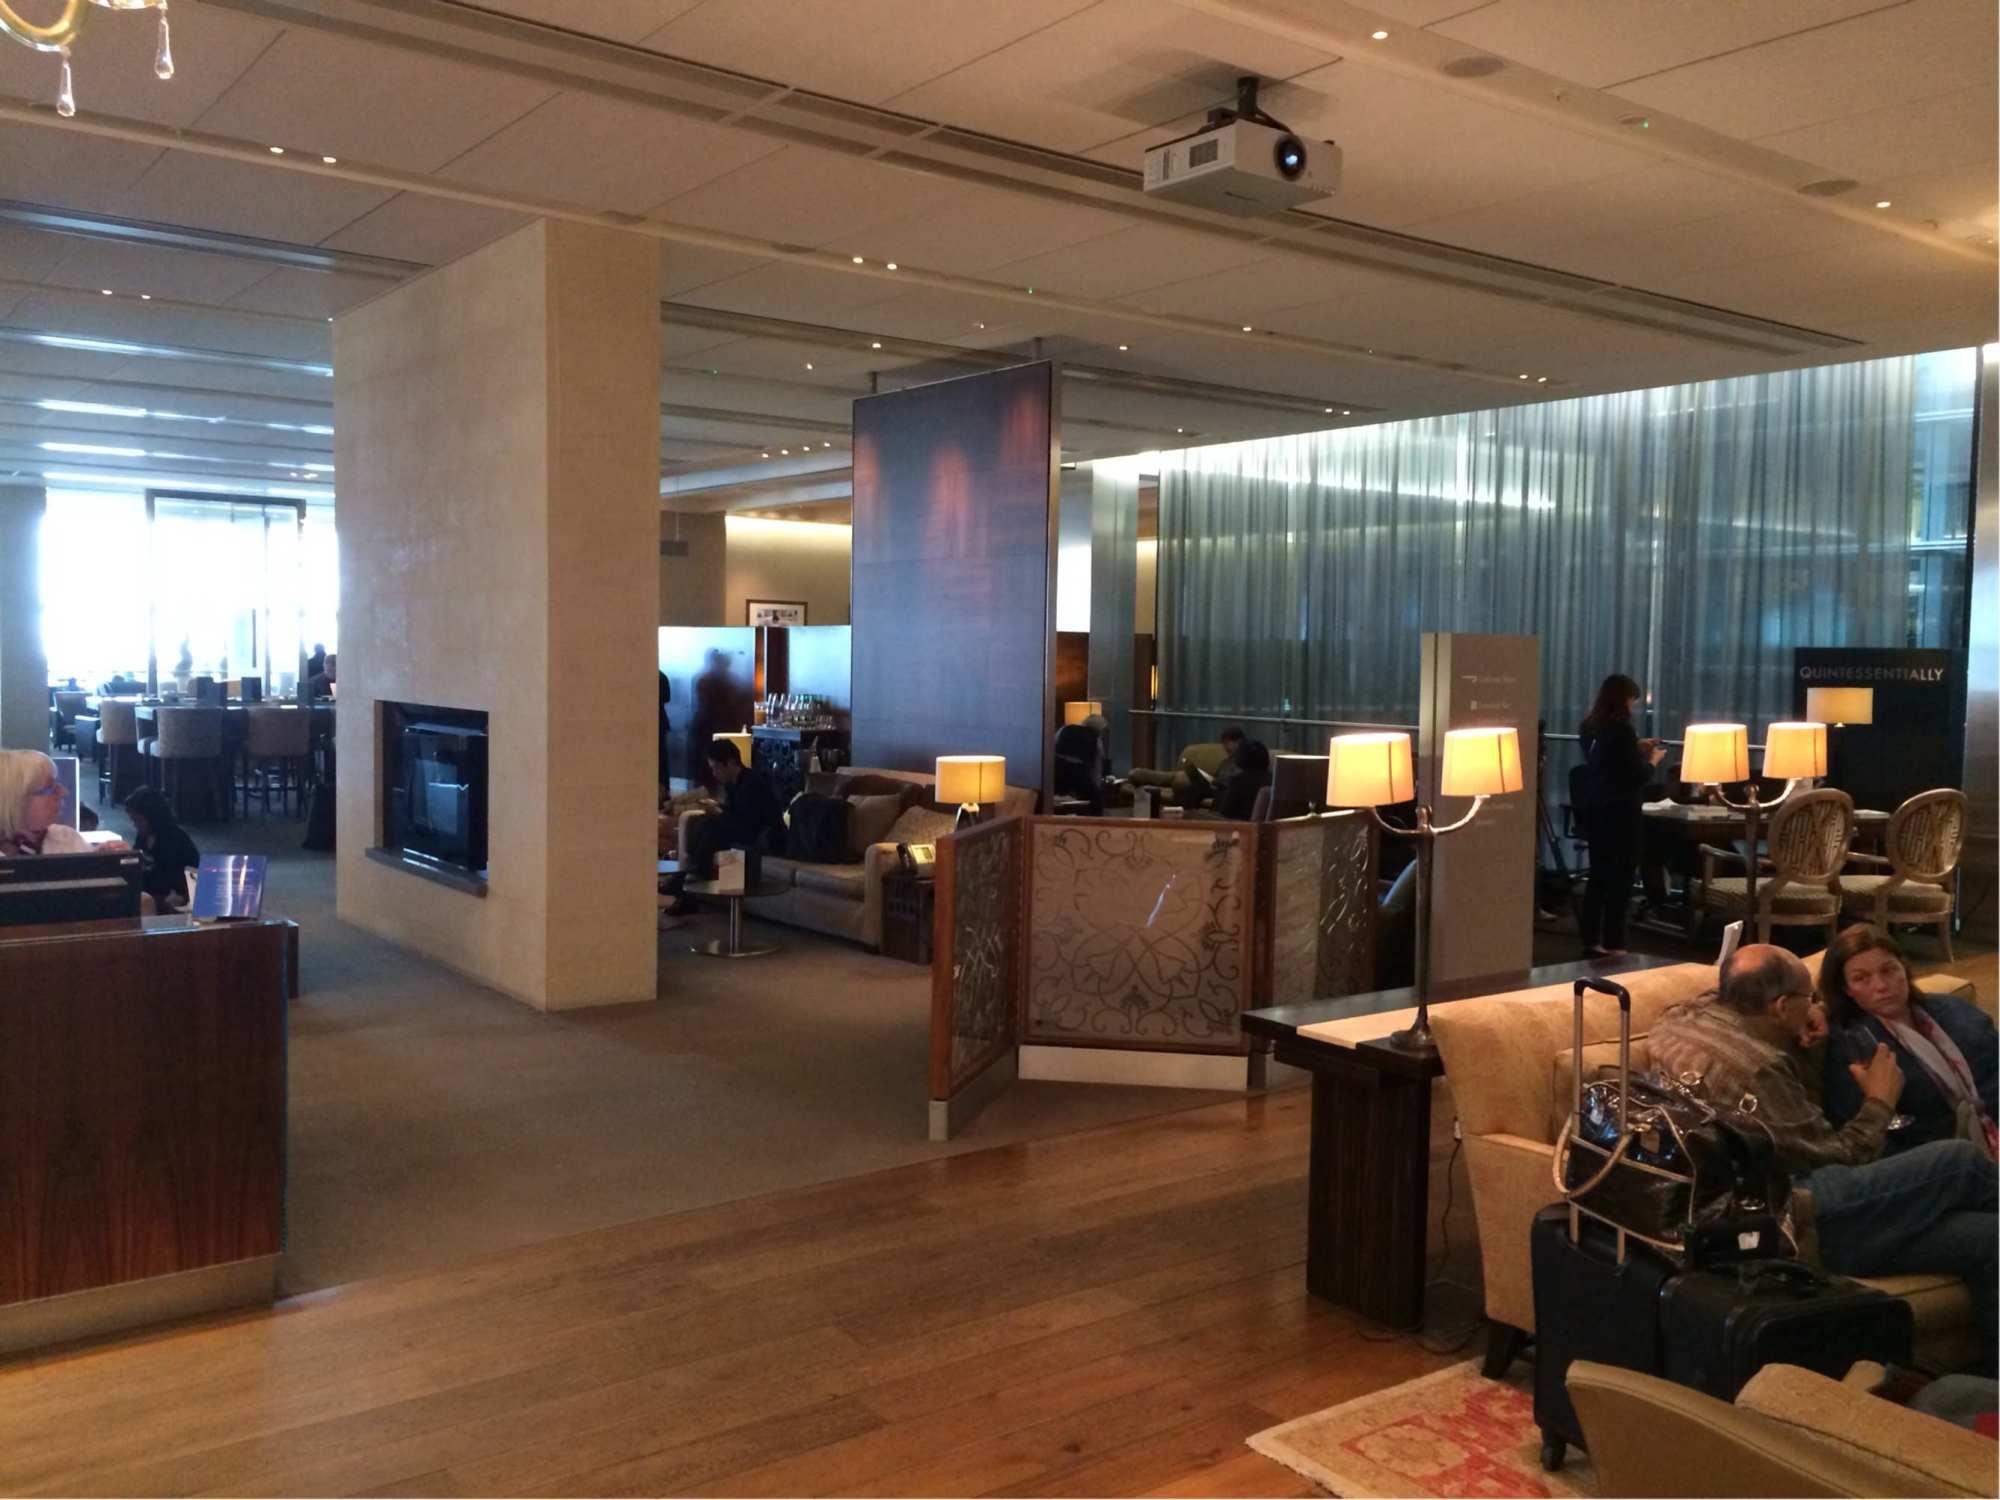 Is British Airways Lounge Free For Business Traveler